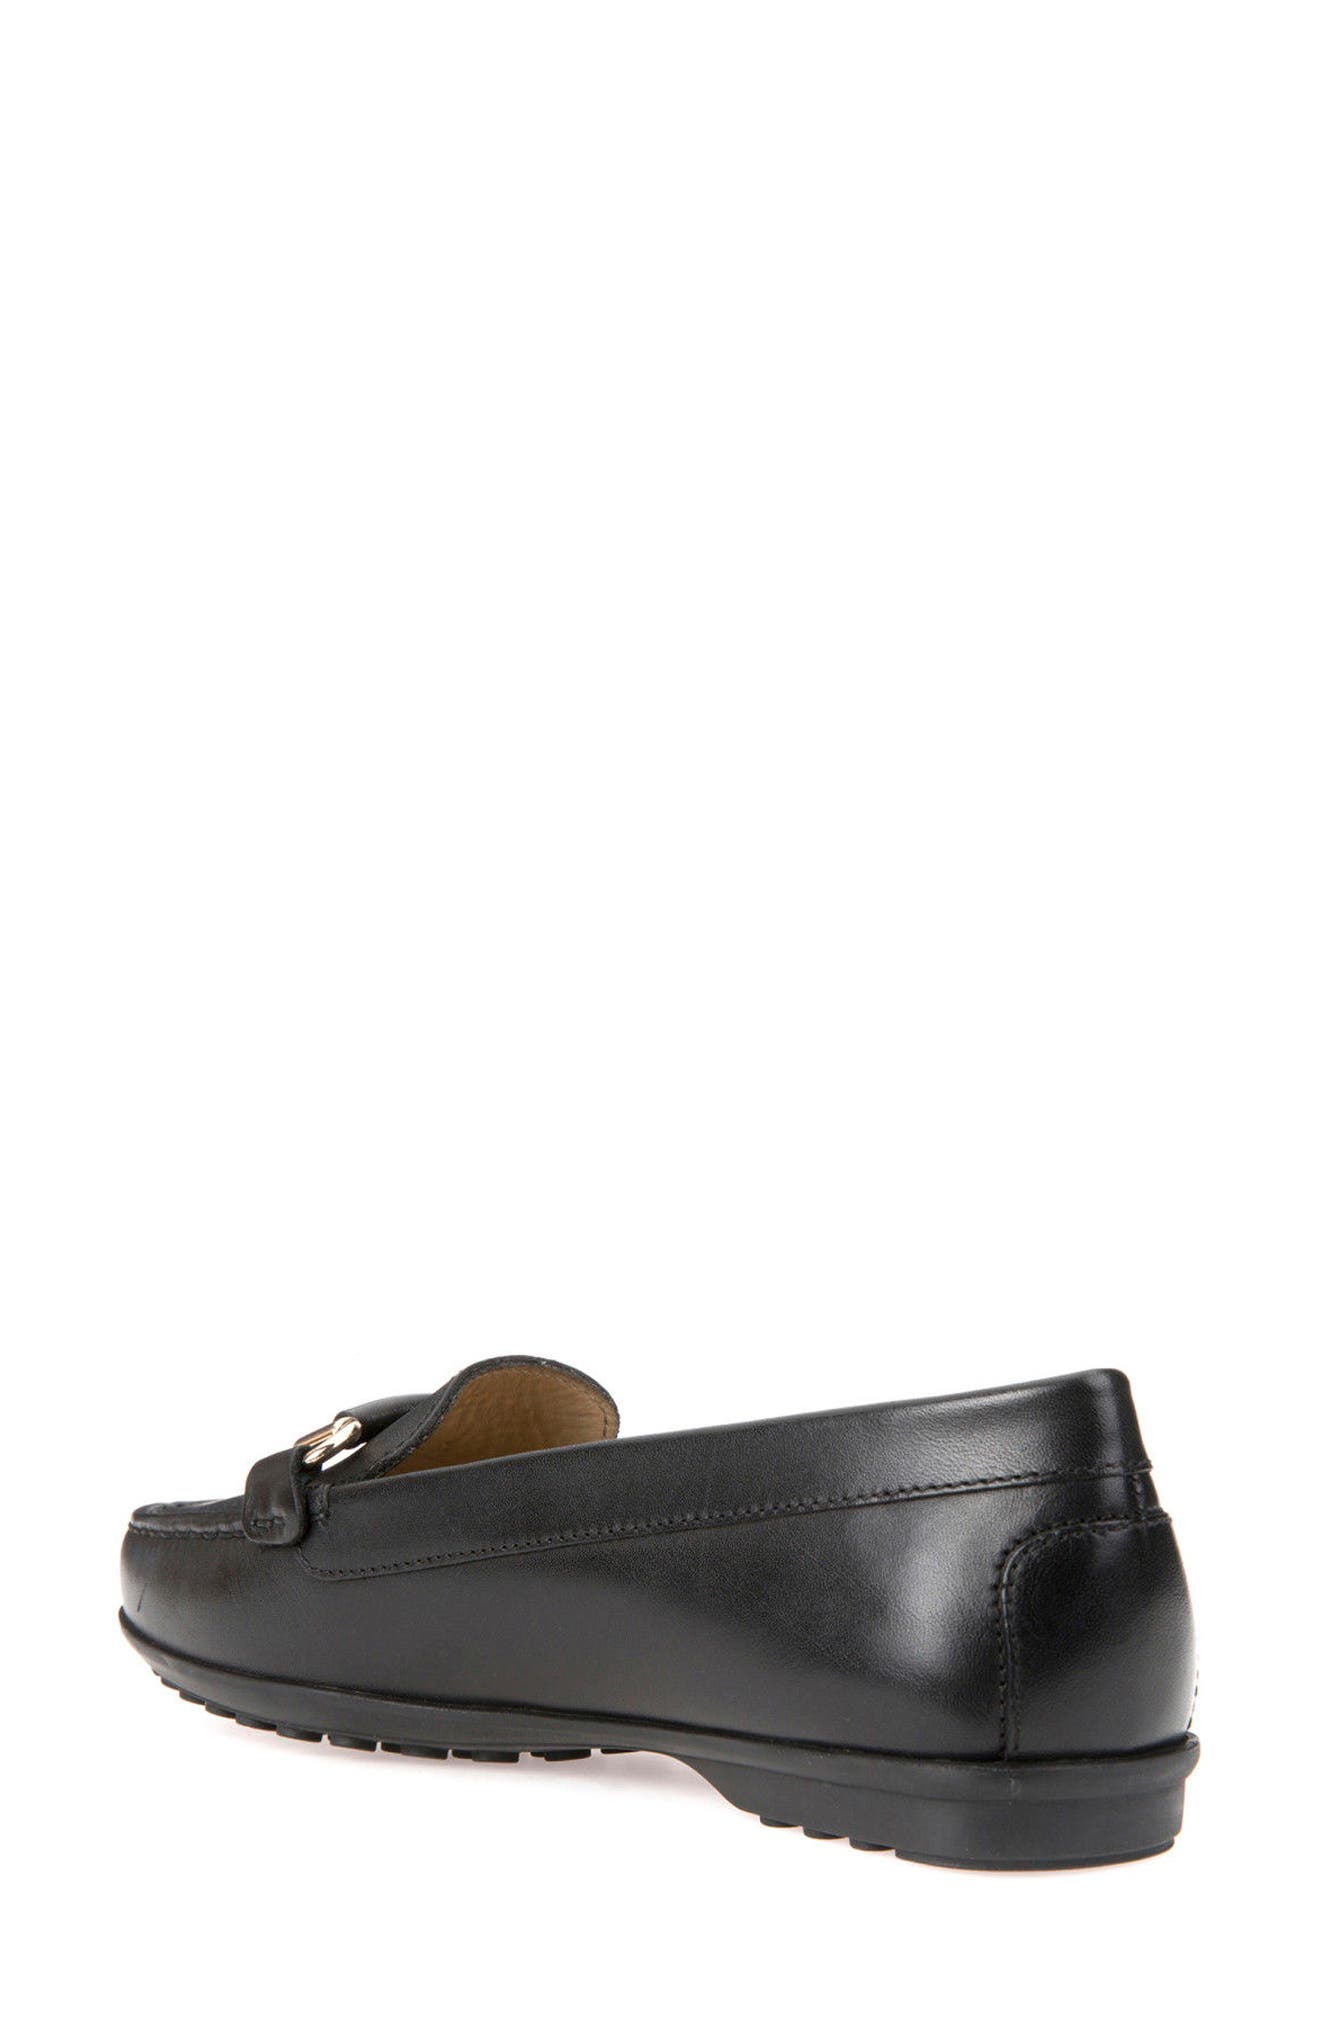 Elidia Buckle Loafer,                             Alternate thumbnail 2, color,                             Black Leather